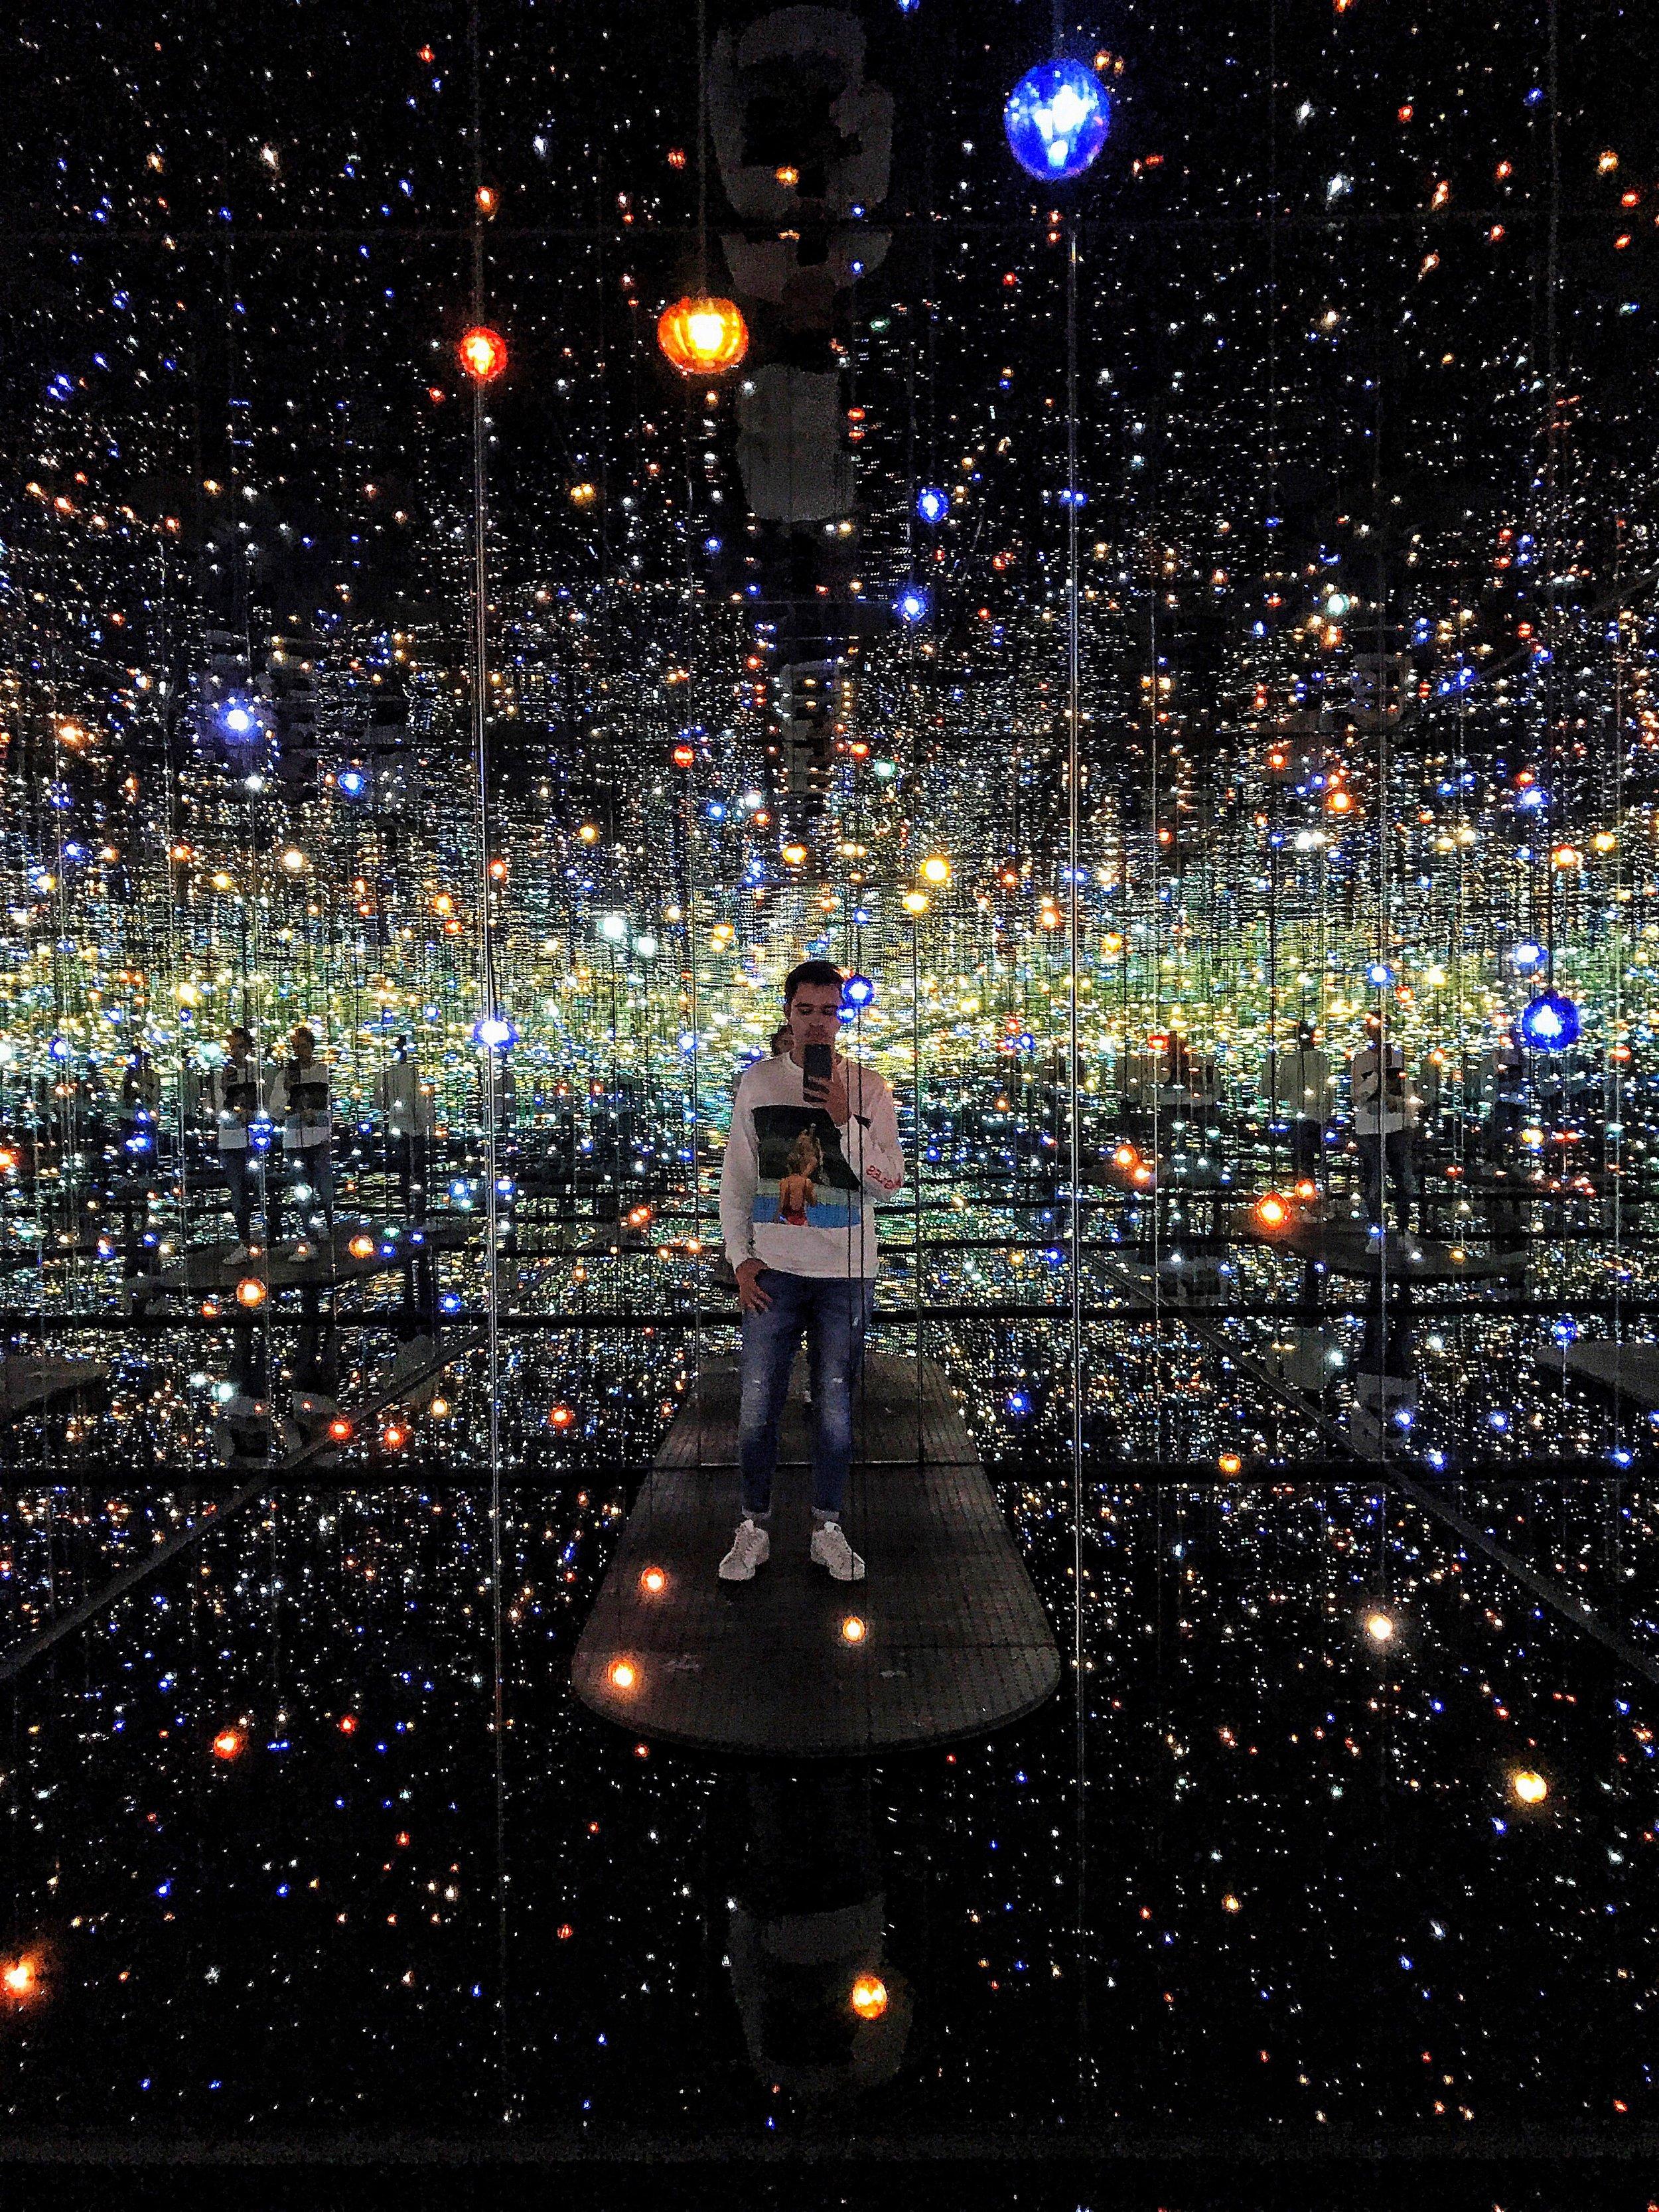 Yayoi Kusama, Infinity Mirrored Room